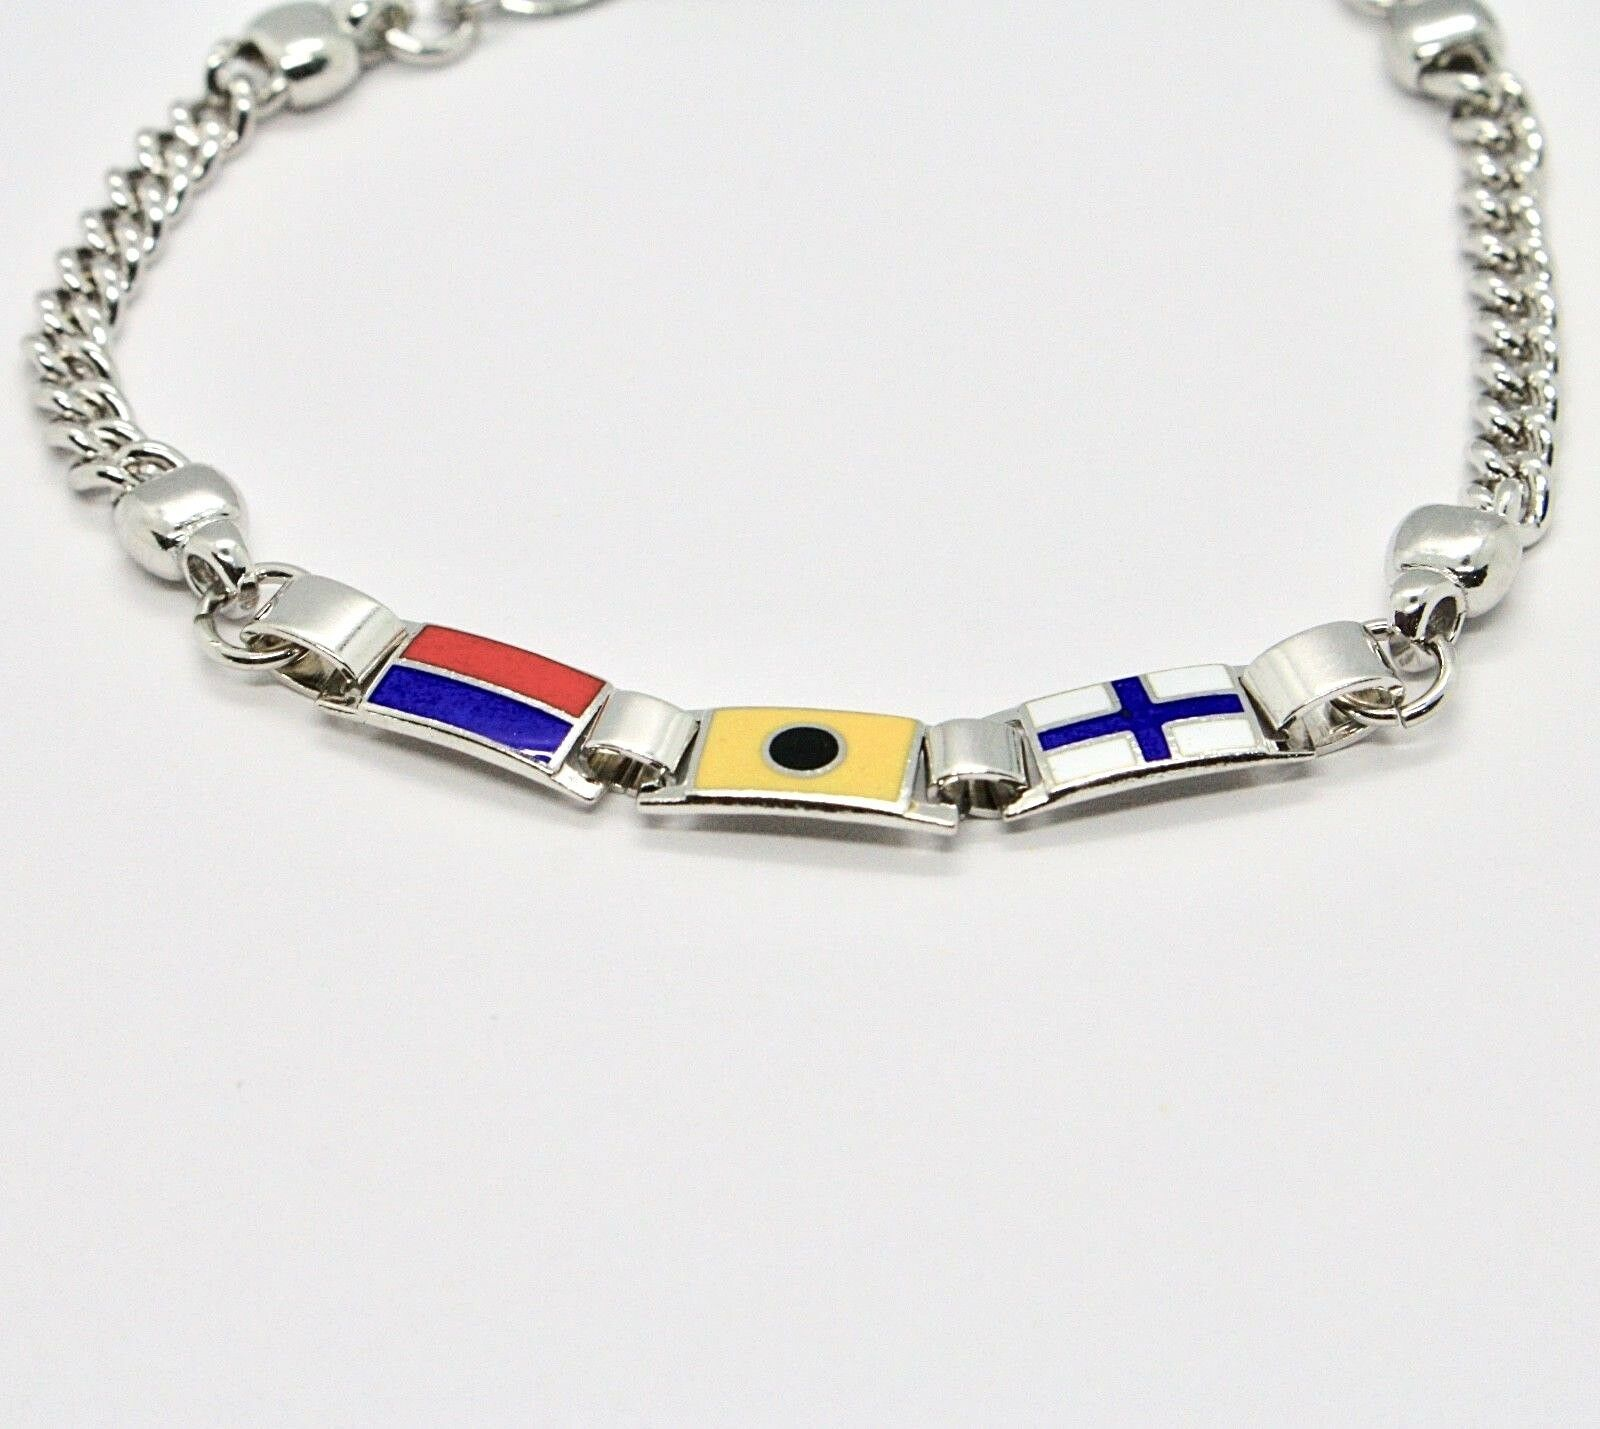 Armband 925 Silber Rhodiniert mit Flaggen Offz. Blaue Paspel Emaille Made in